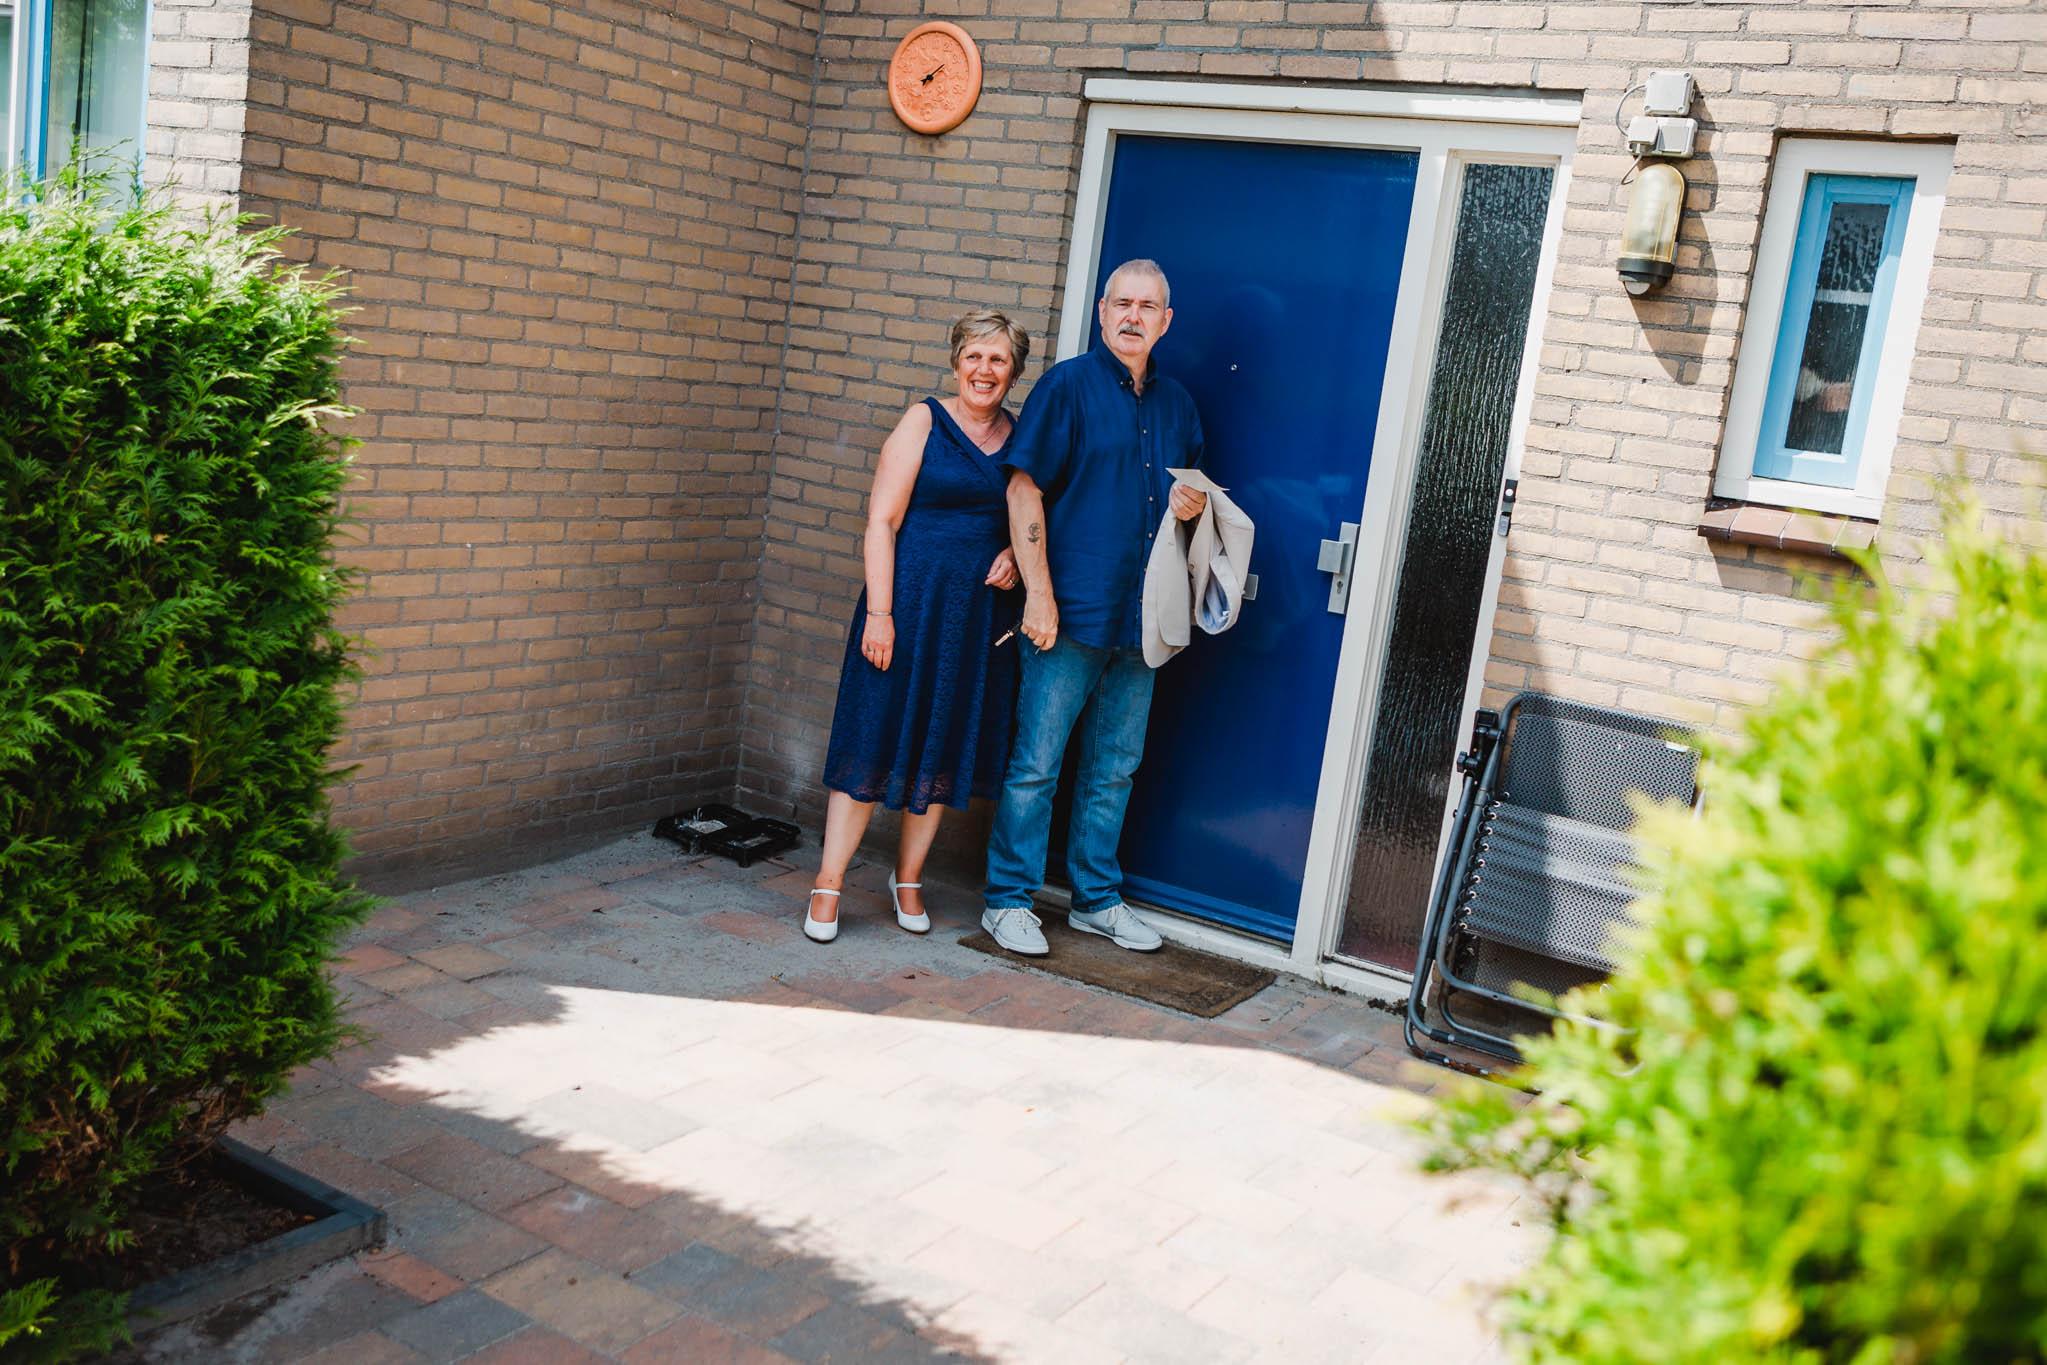 Bruiloft Reportage Geregistreerd Partnerschap Flevoland Lelystad Shot By Sylla 8